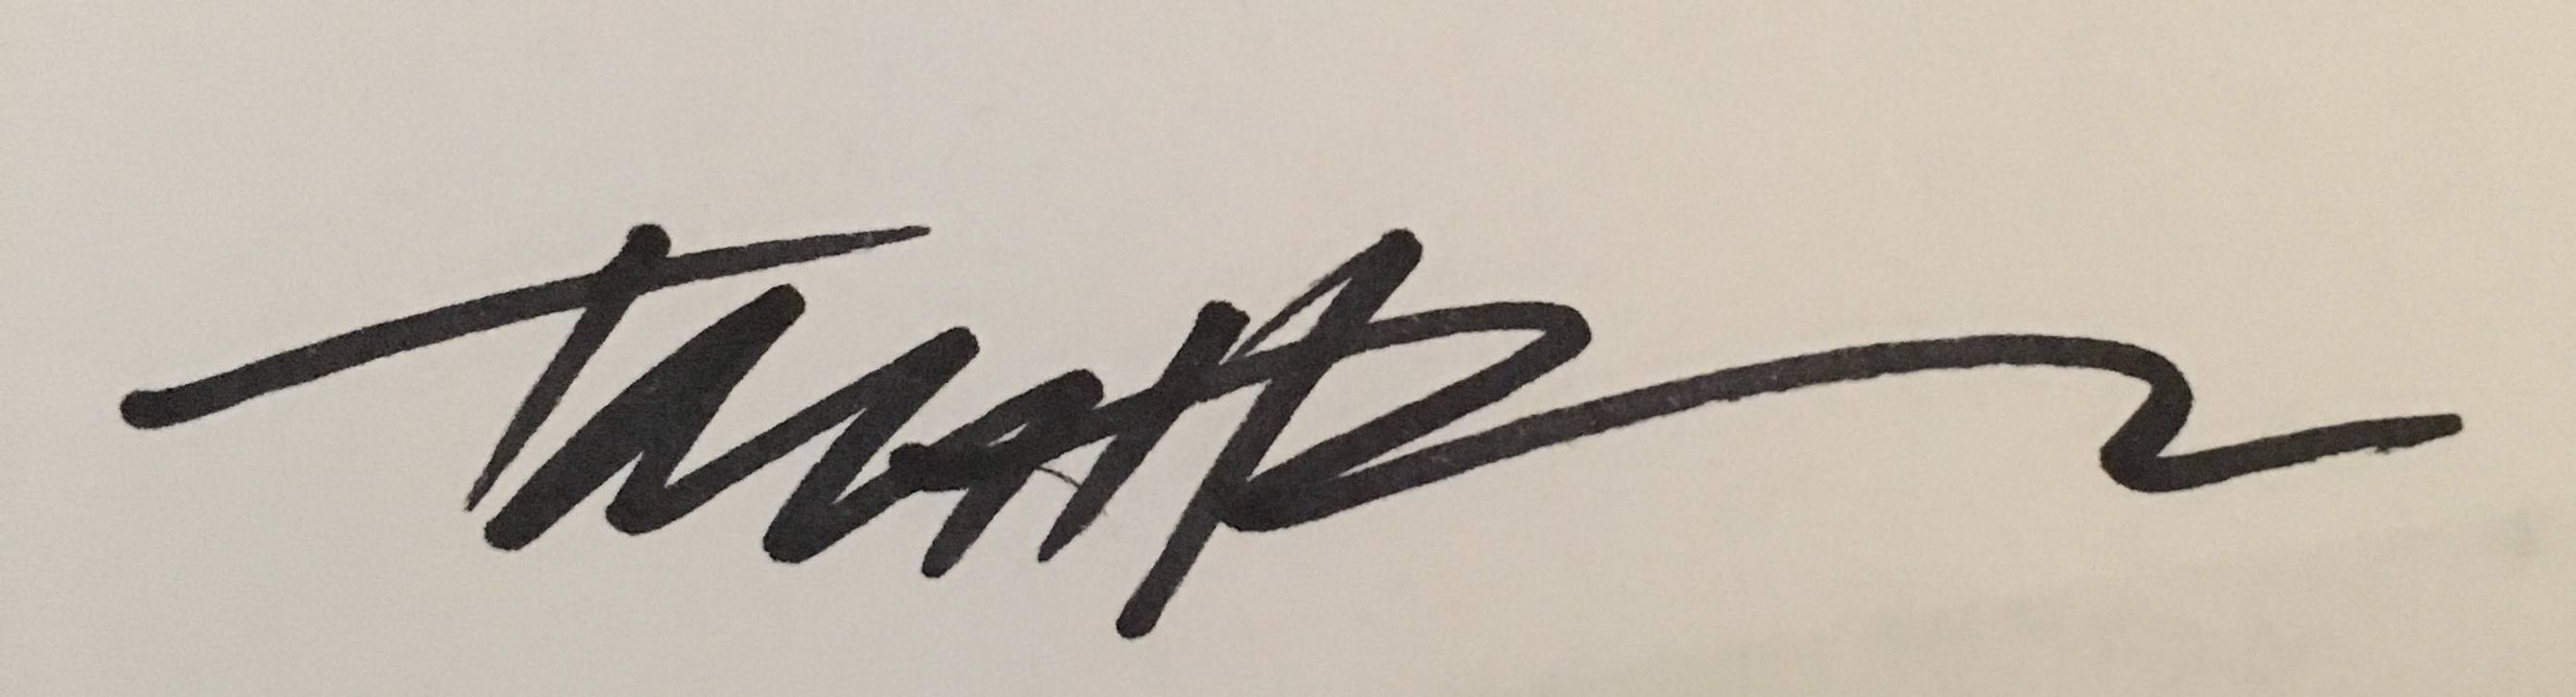 Tom Hoffman Signature